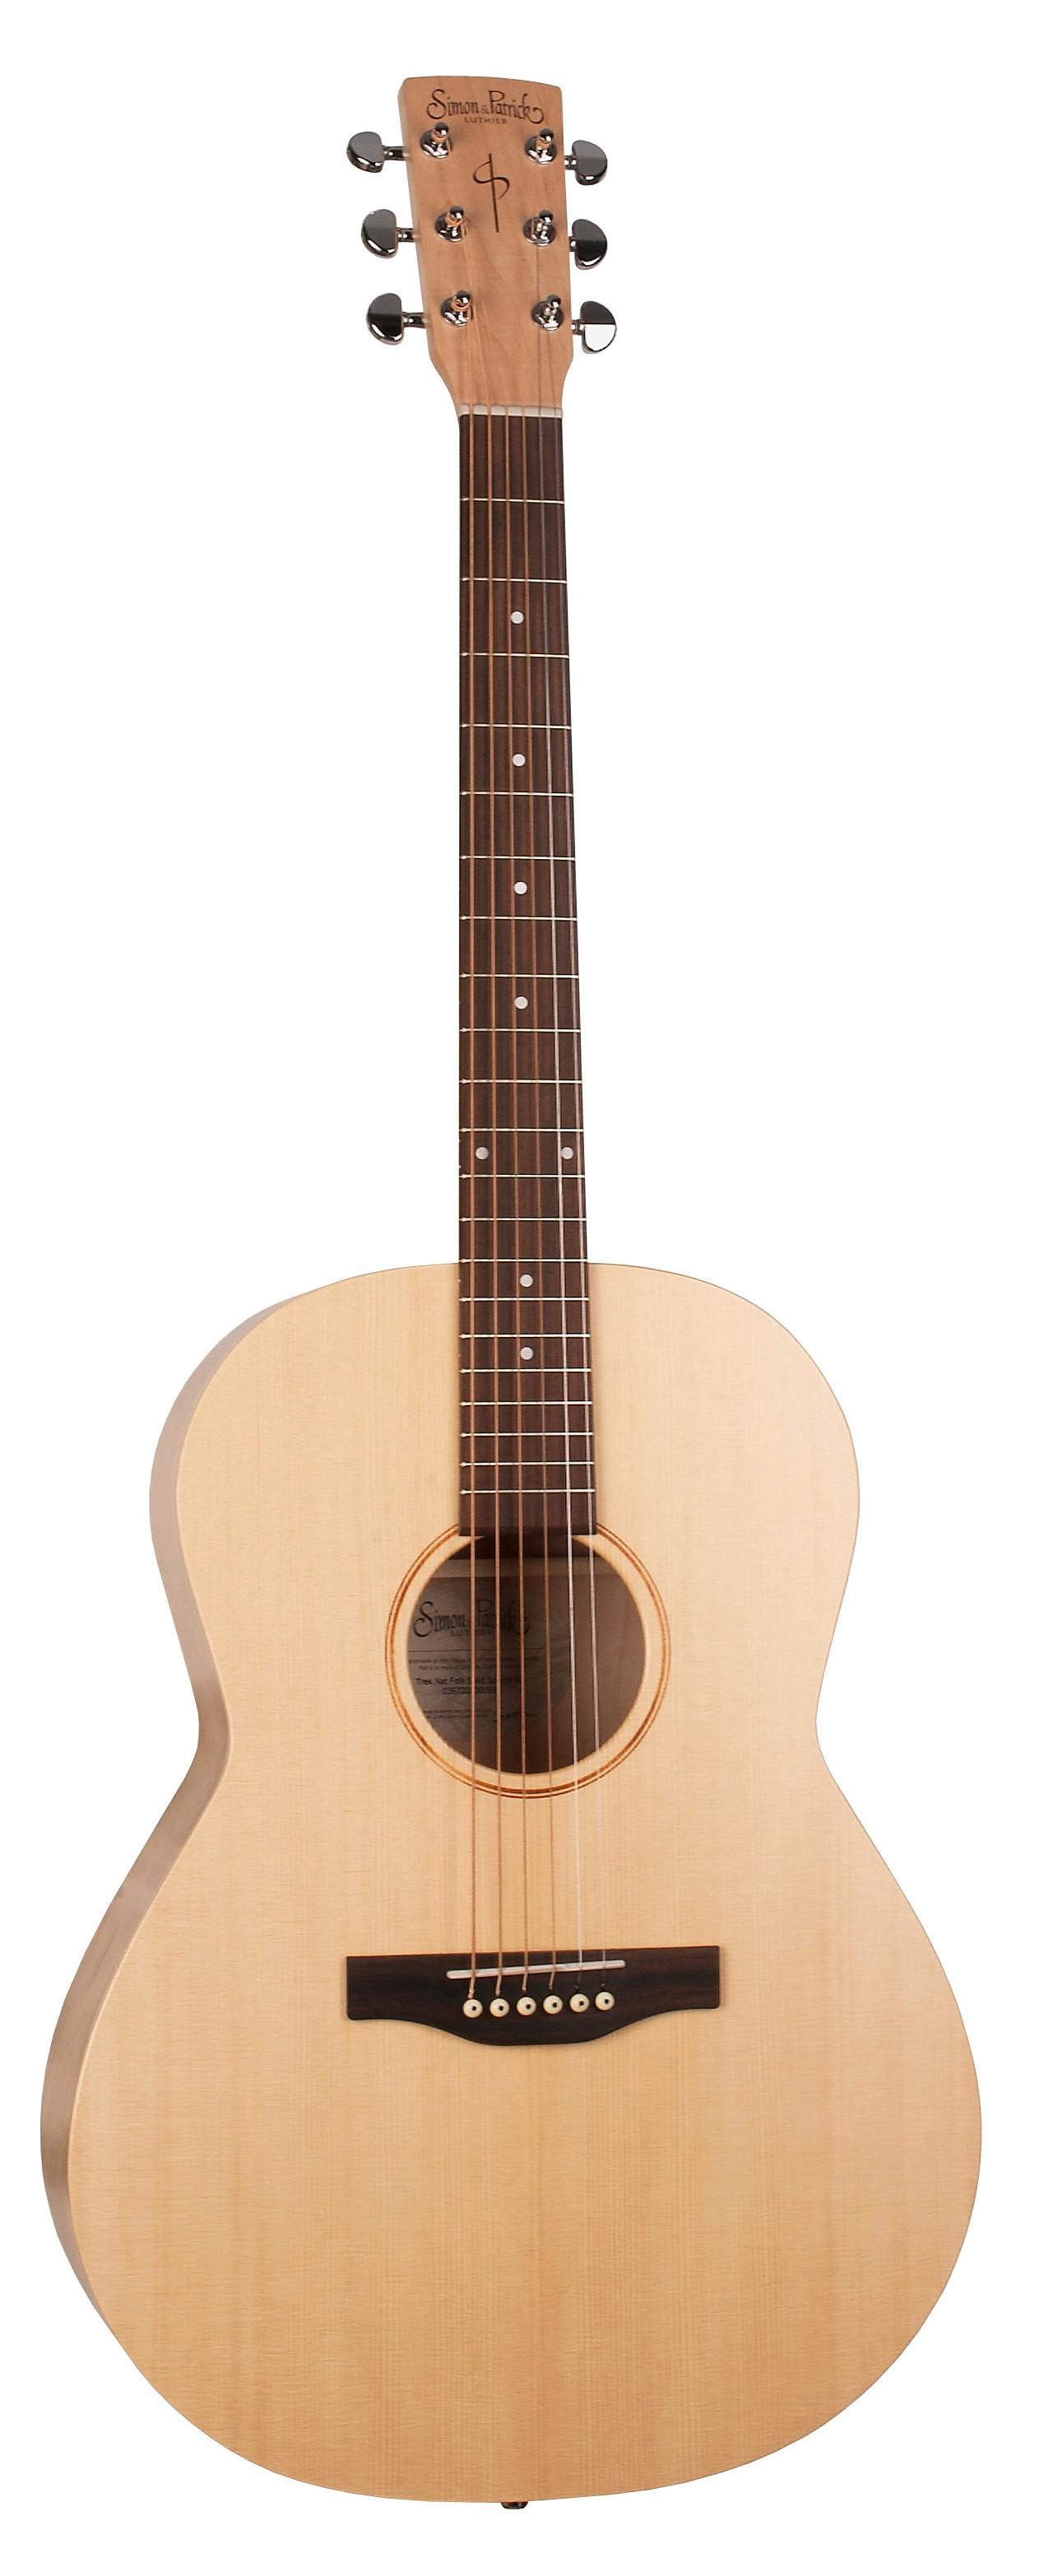 Simon & Patrick 39722 Trek Natural Spruce Folk Acoustic Guitar